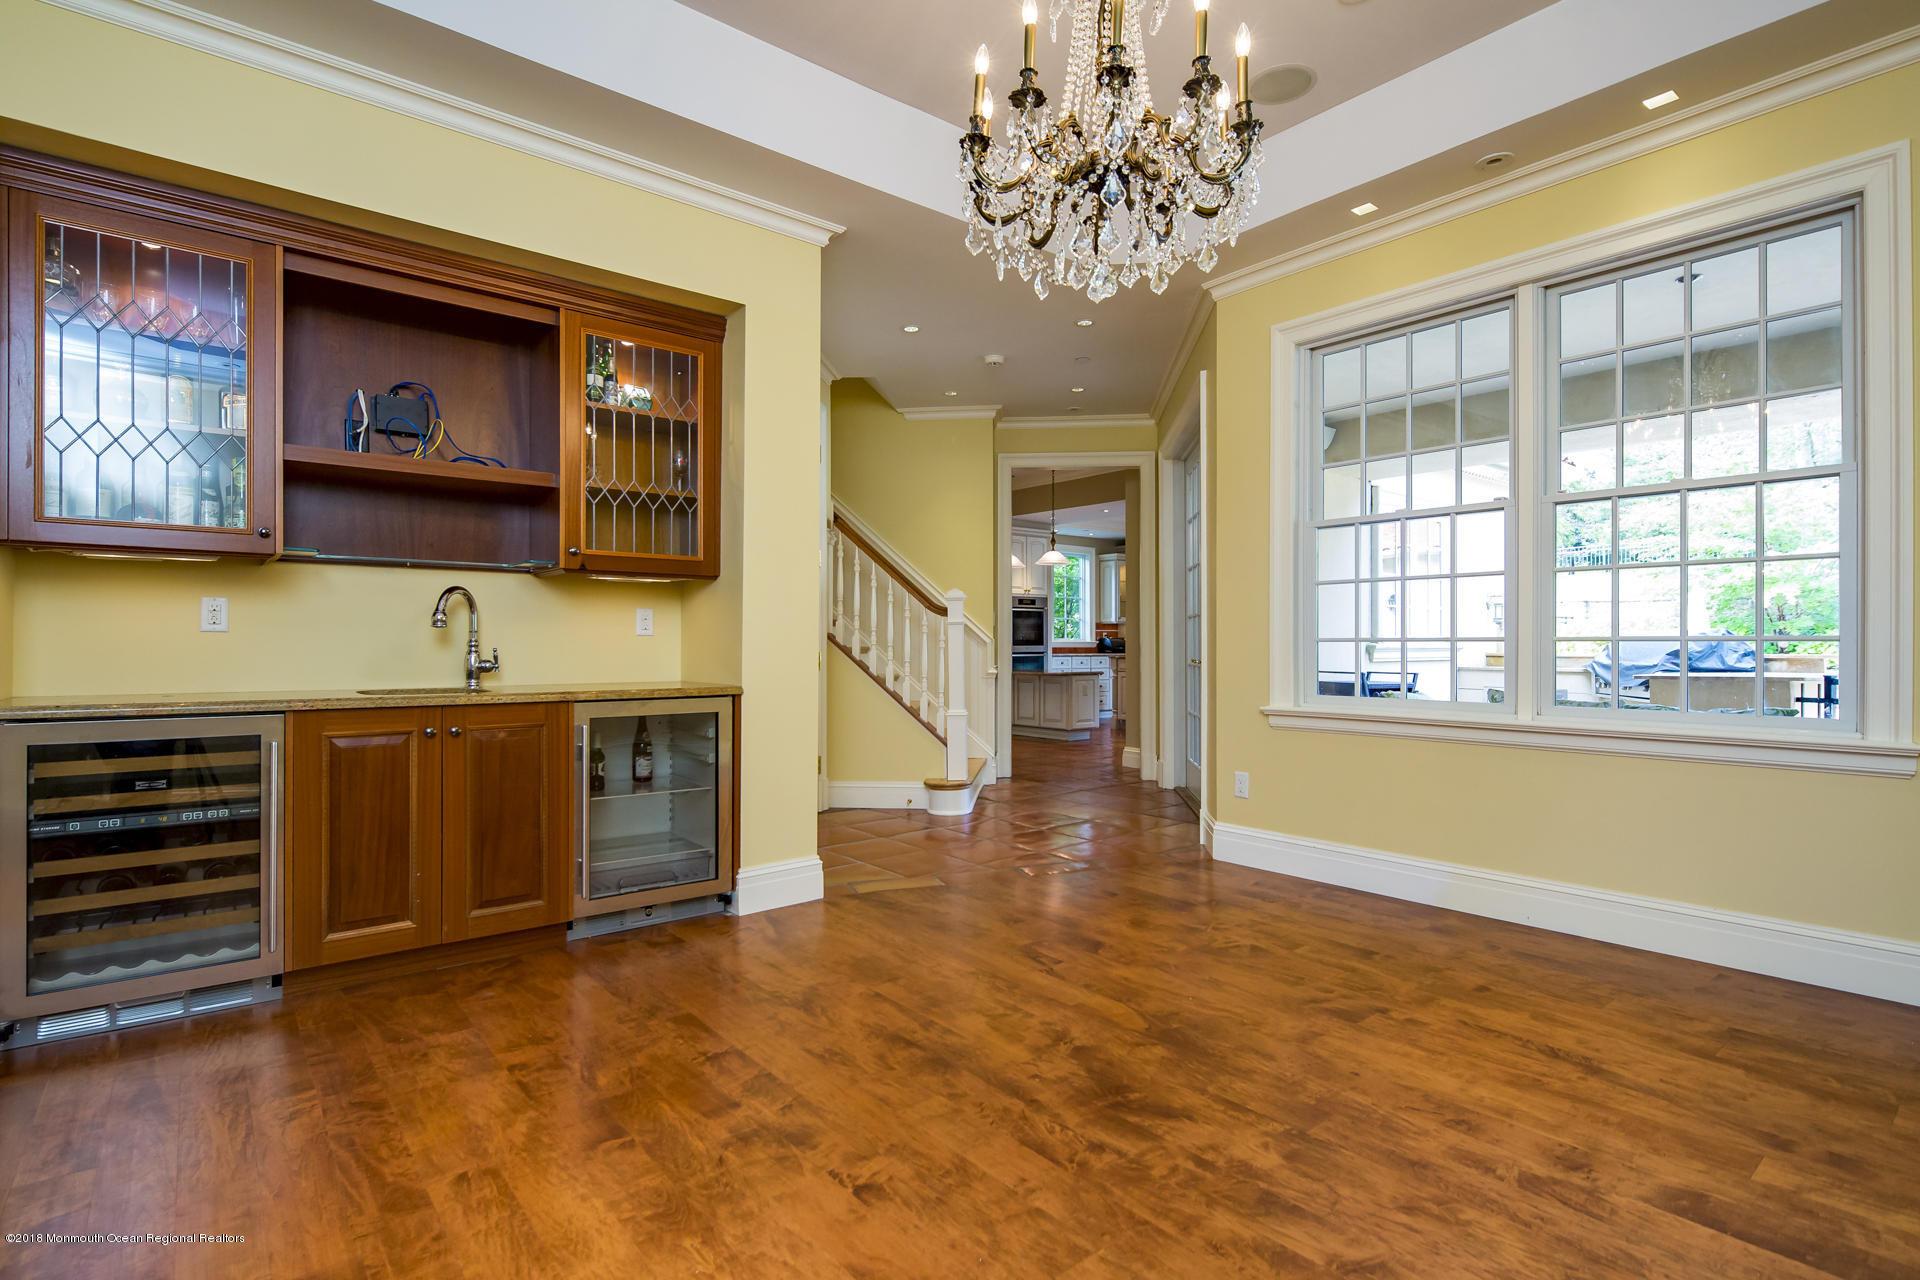 Missouri Hardwood Flooring Company Of Heritage House sothebys International Realty Inside 20181008195925655725000000 O